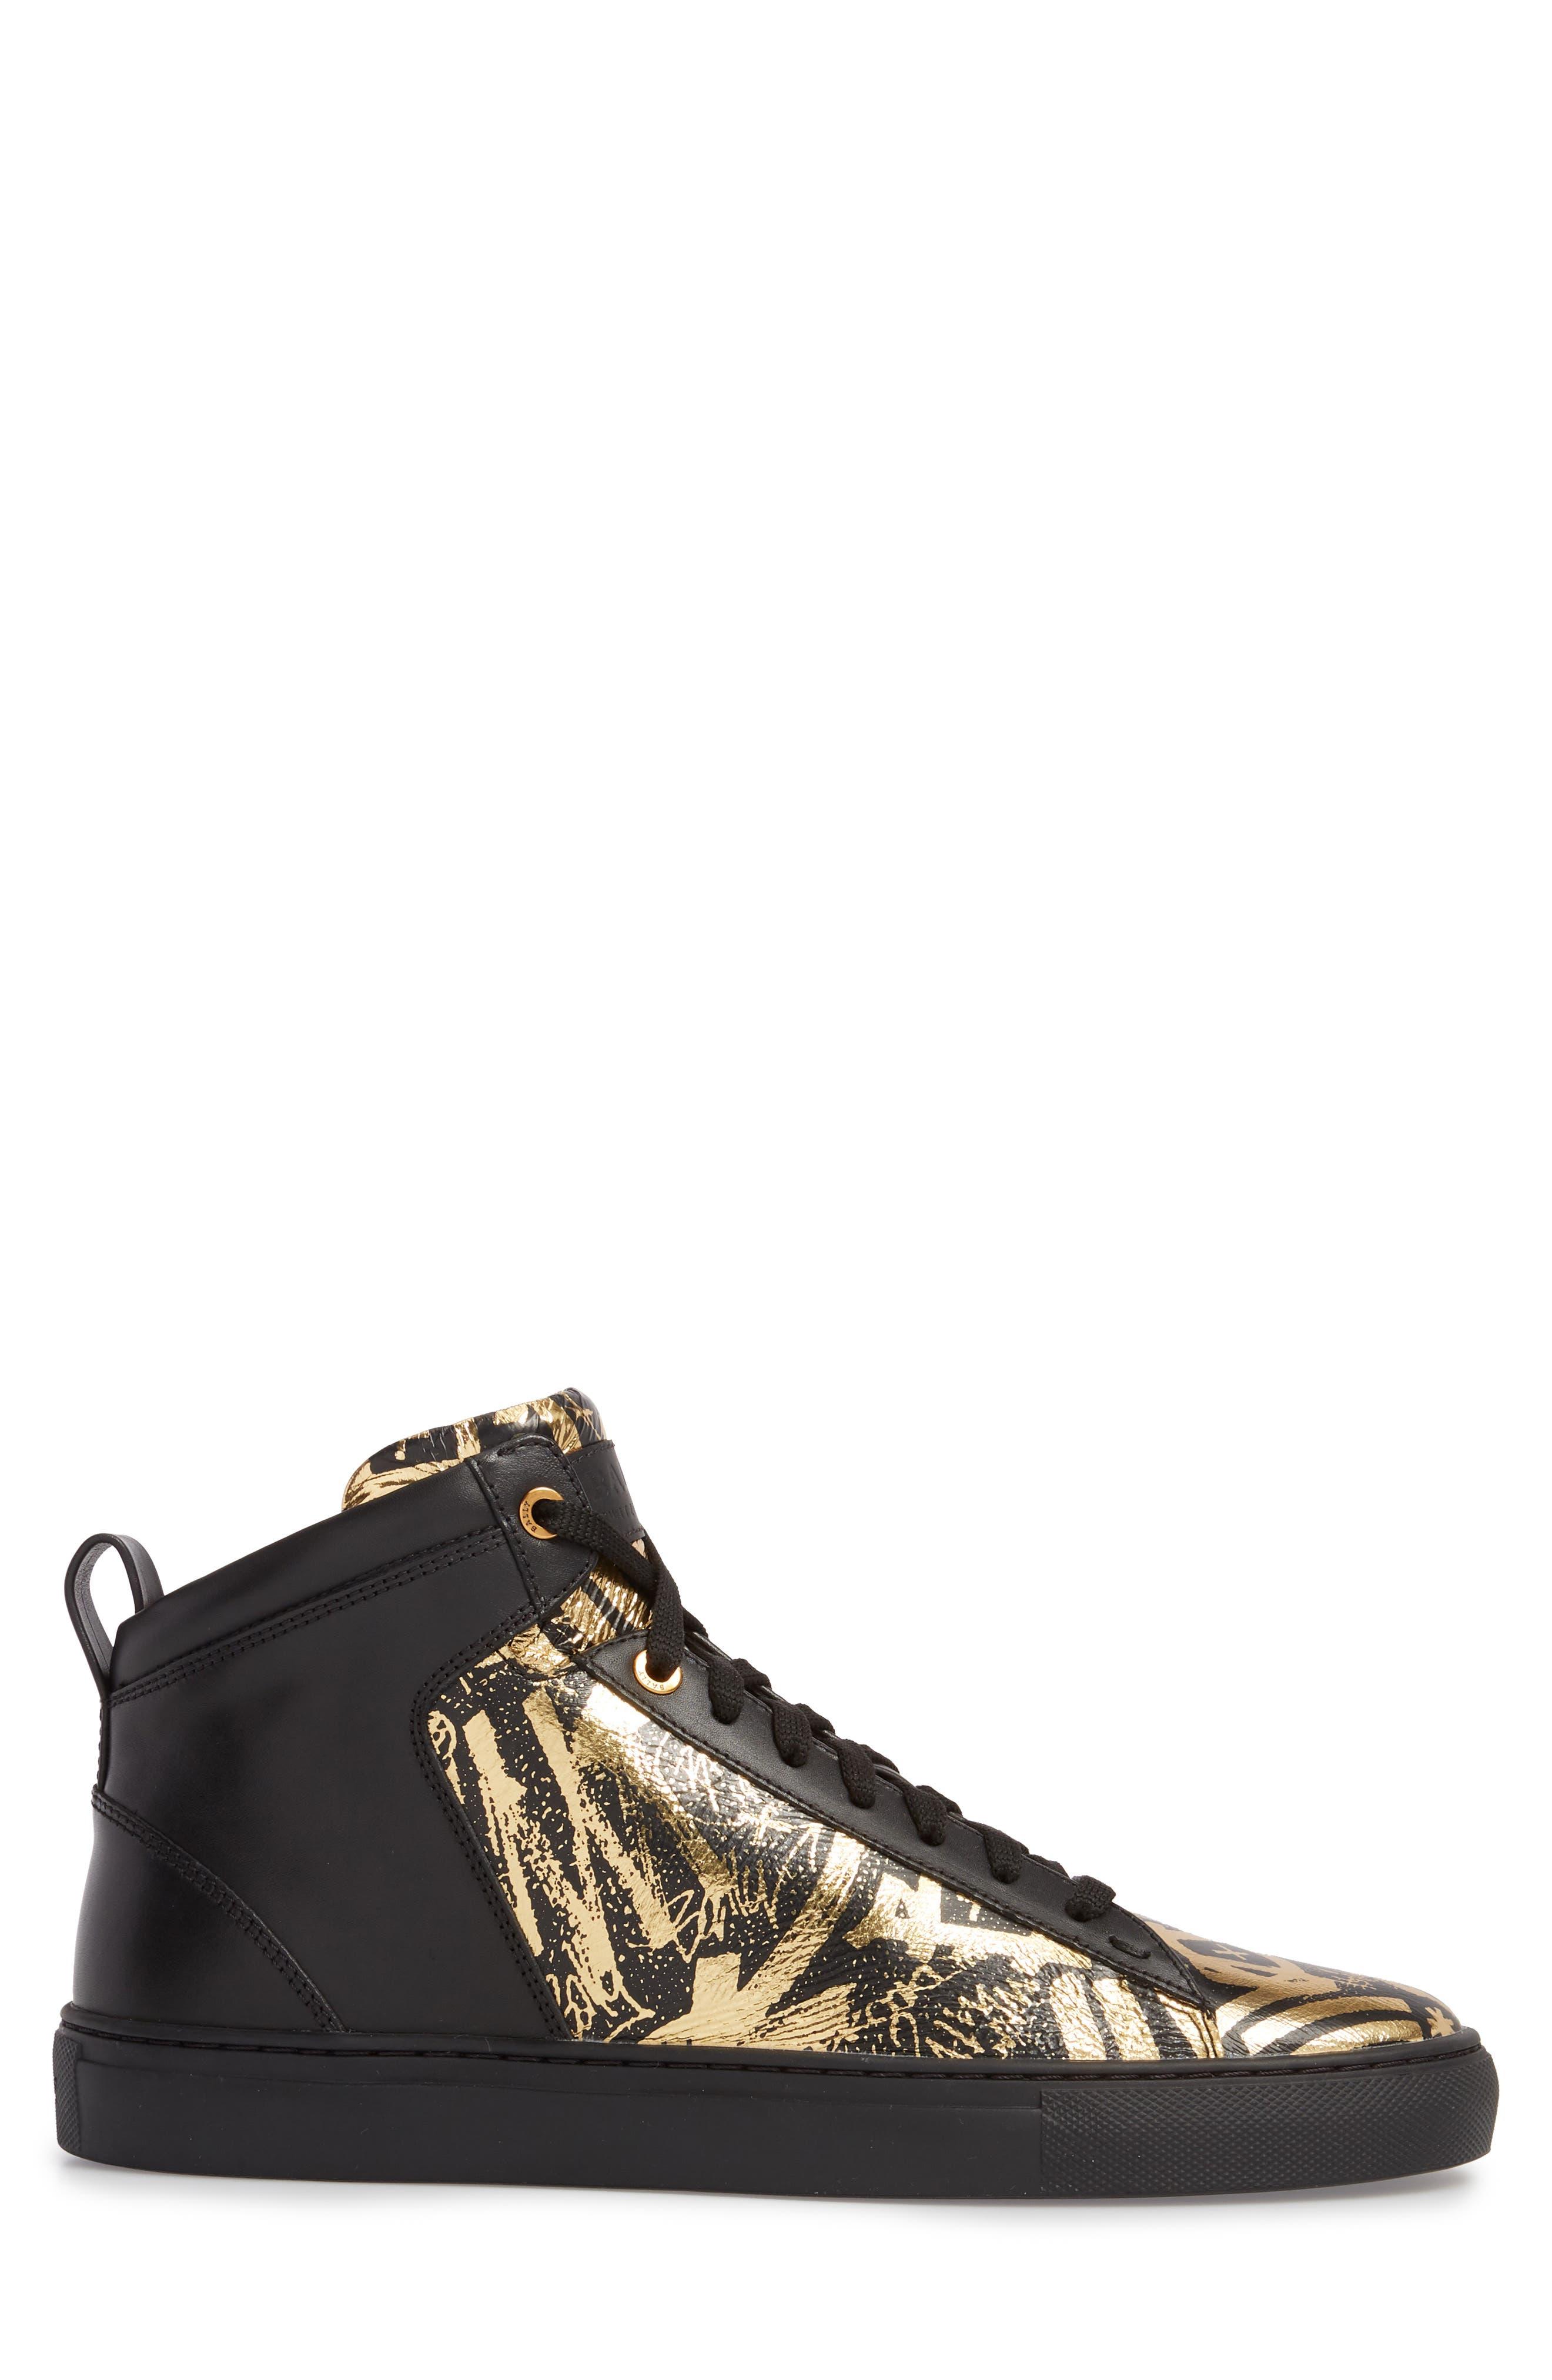 Hedo High Top Sneaker,                             Alternate thumbnail 3, color,                             GOLD